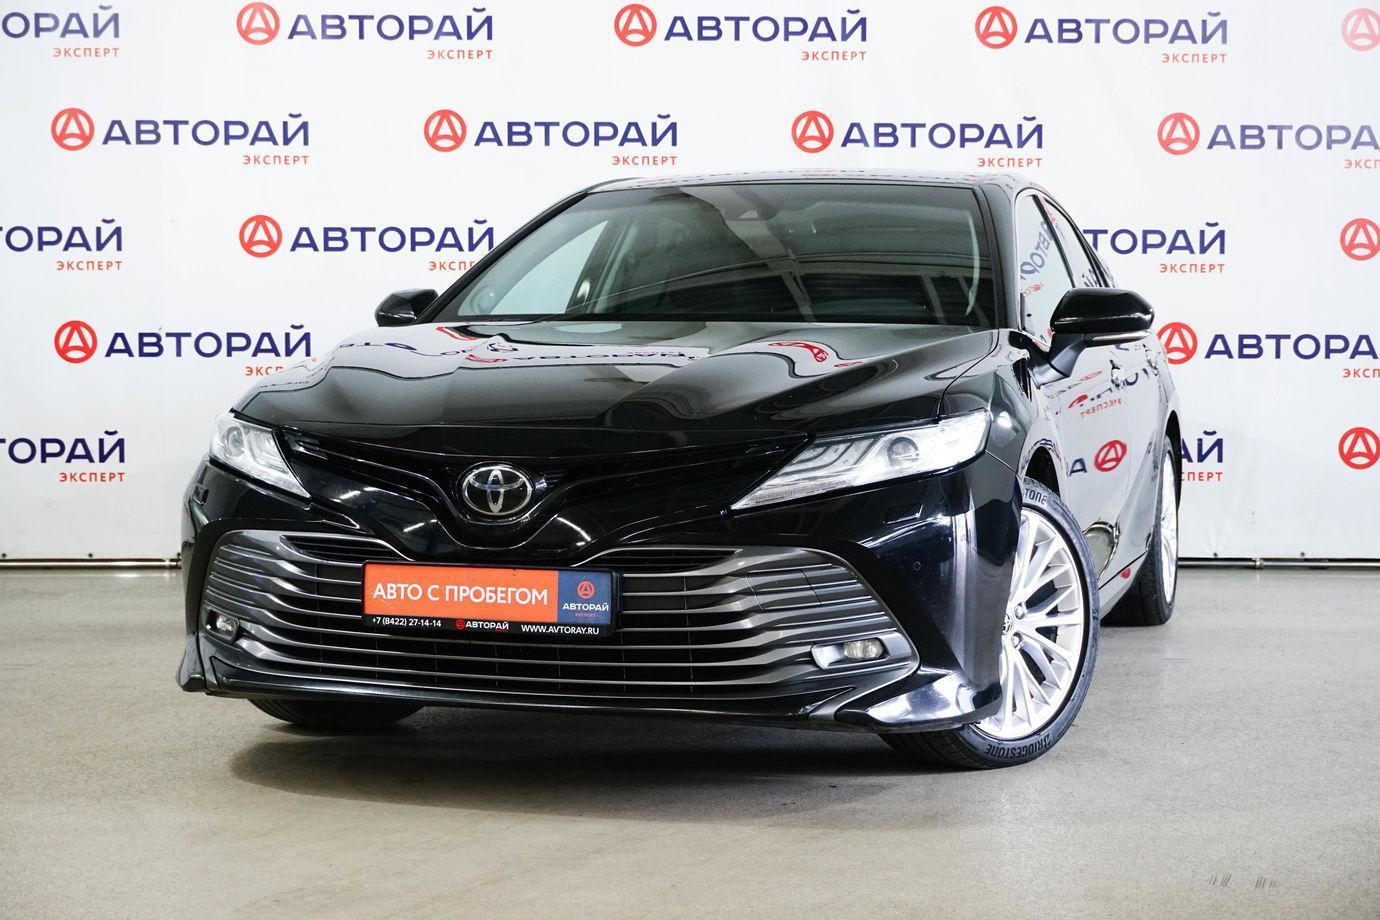 Toyota Camry, VIII (XV70) 2018г.